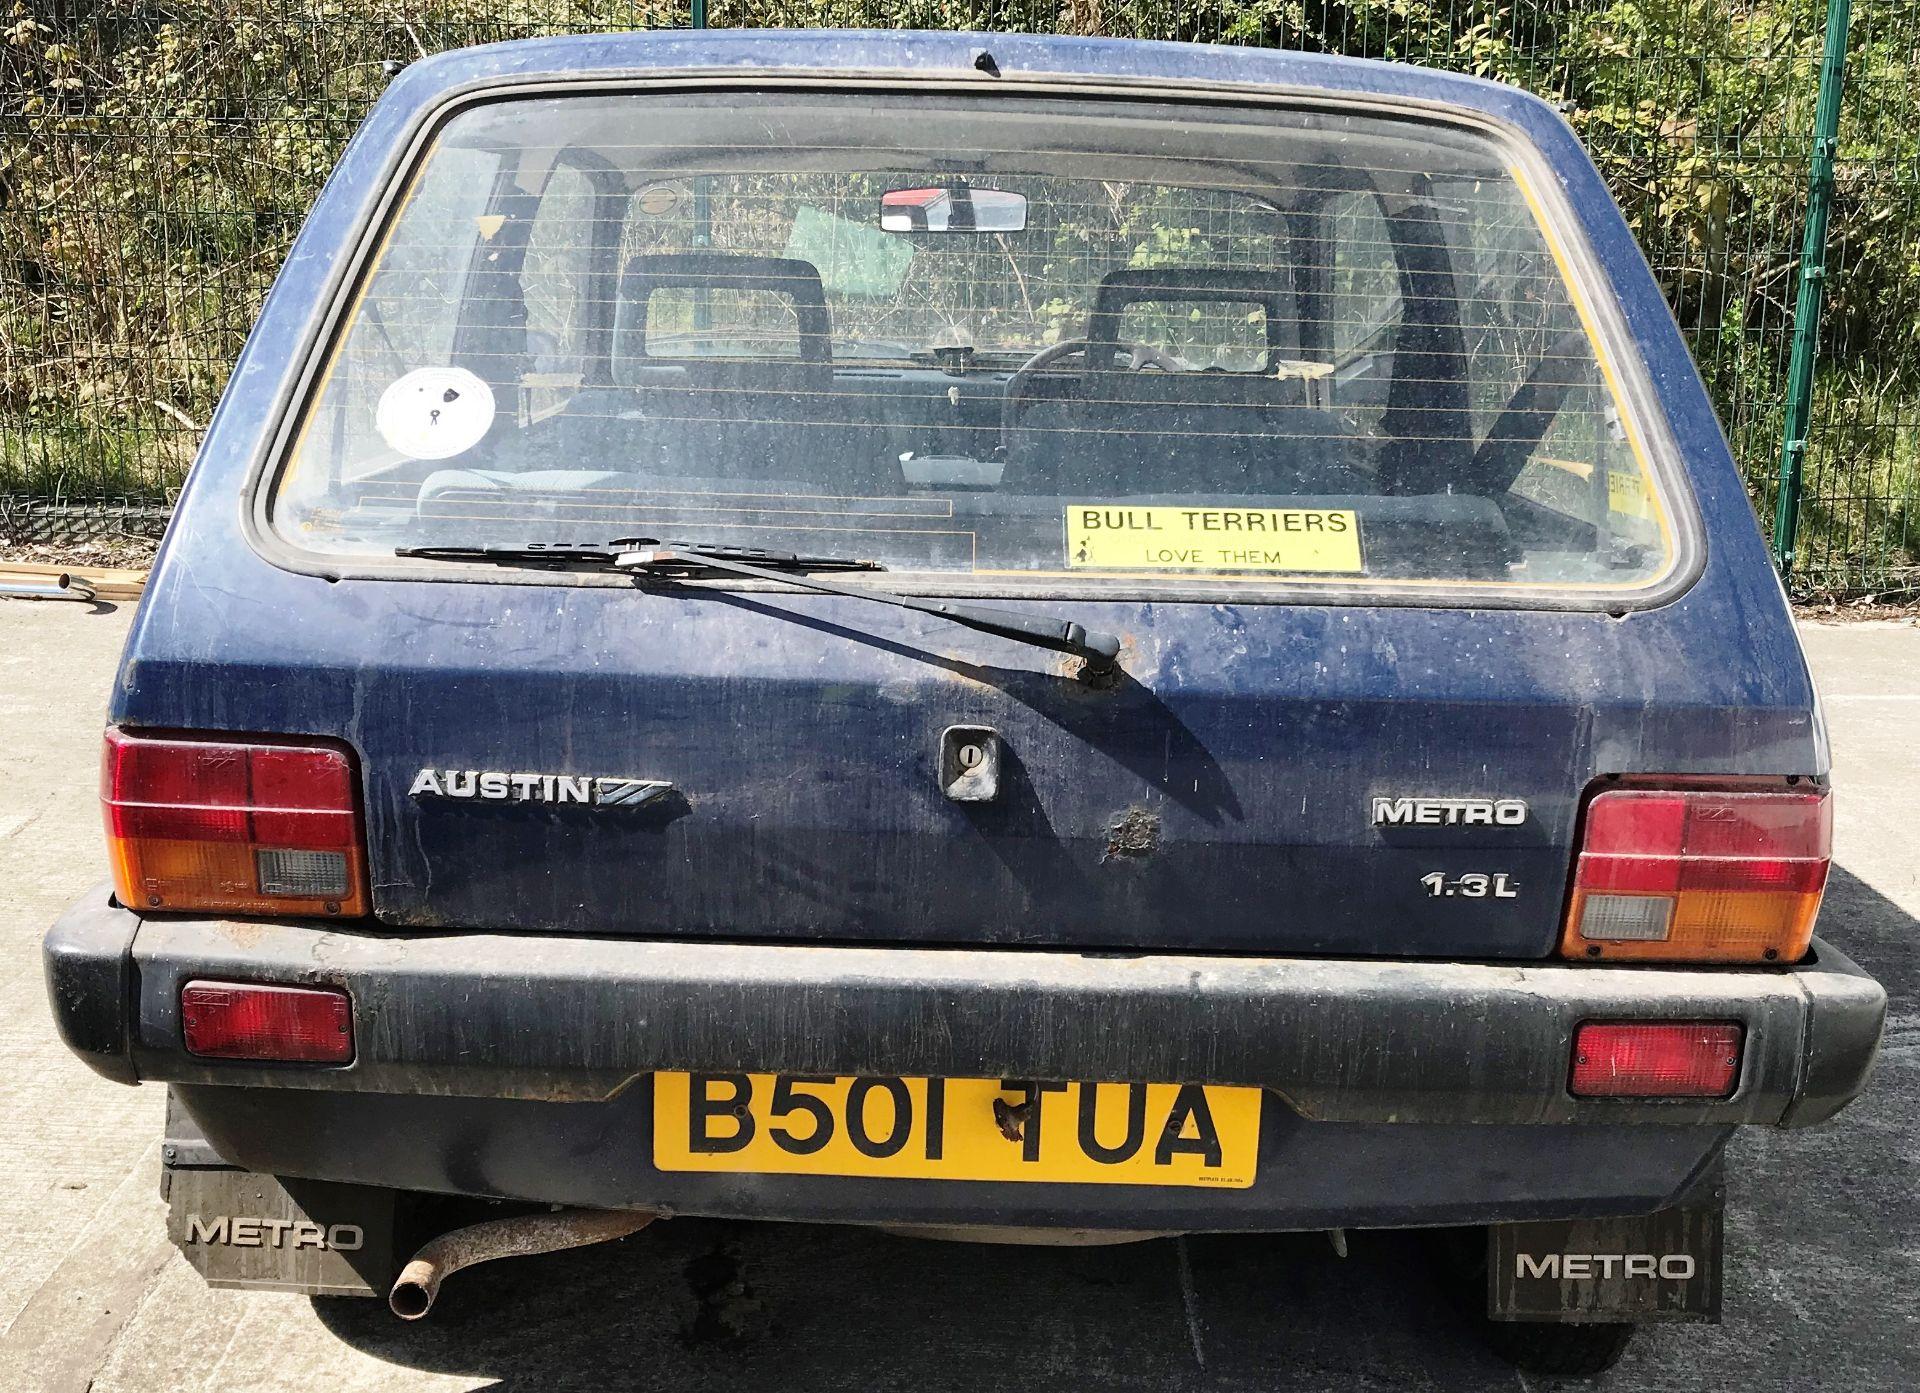 GARAGE FIND - IN NEED OF FULL RESTORATION AUSTIN METRO 1300L 3 DOOR HATCHBACK - petrol - blue - Image 5 of 11